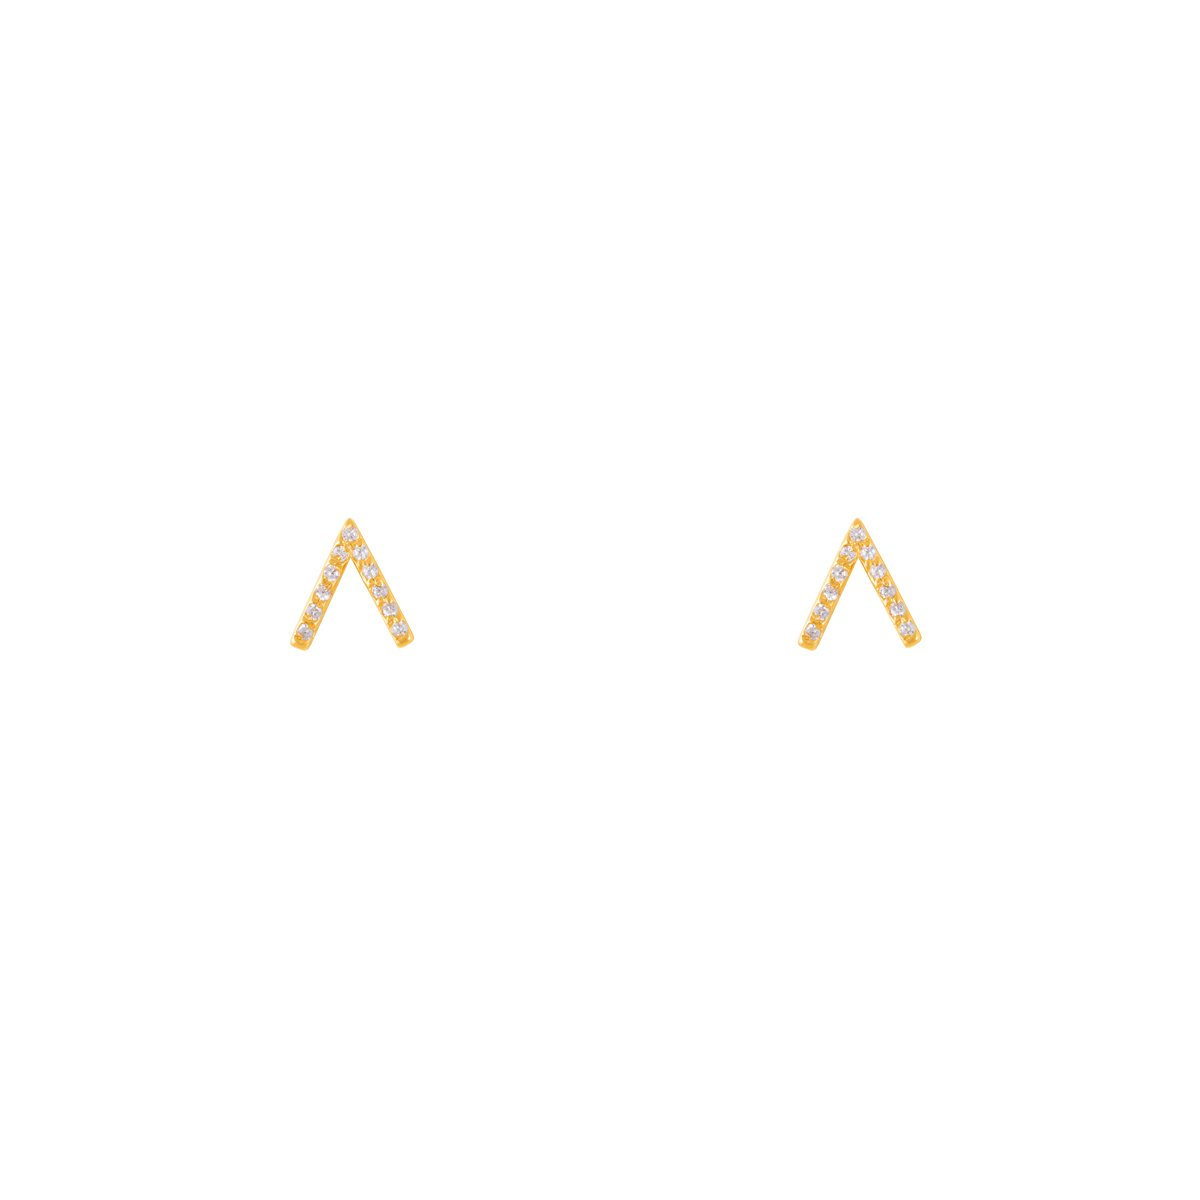 گوشواره طلا دو خط نگین دار